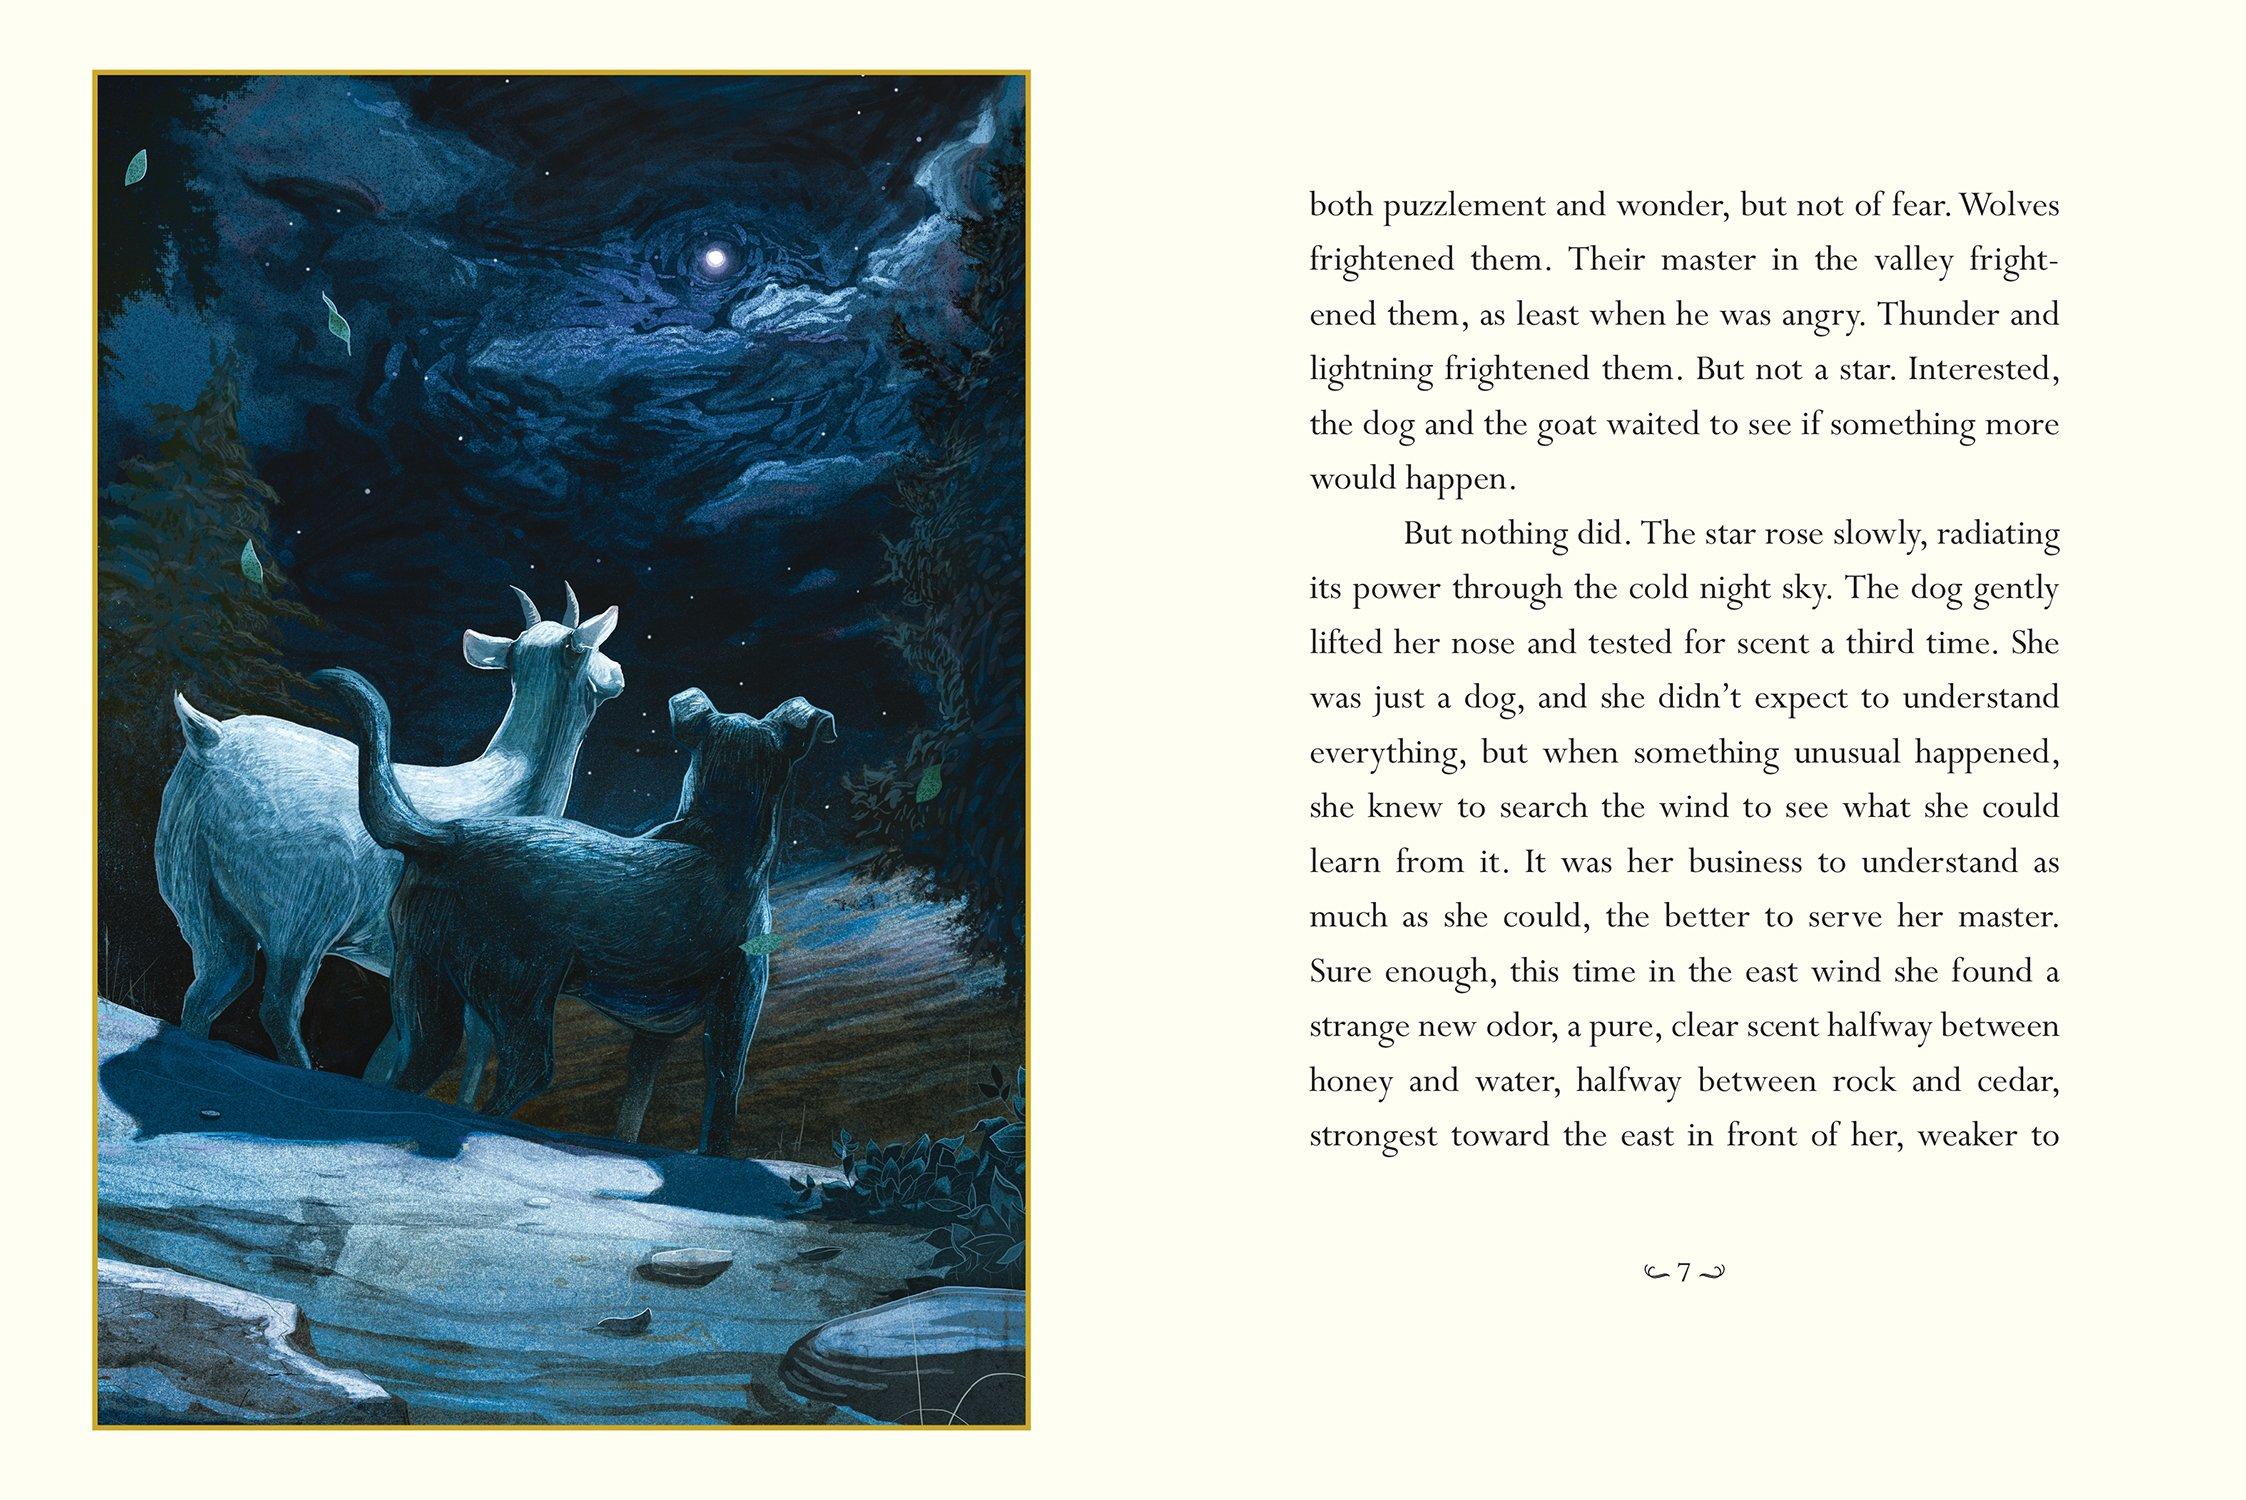 Amazon.com: Certain Poor Shepherds: A Christmas Tale (9780763670627 ...